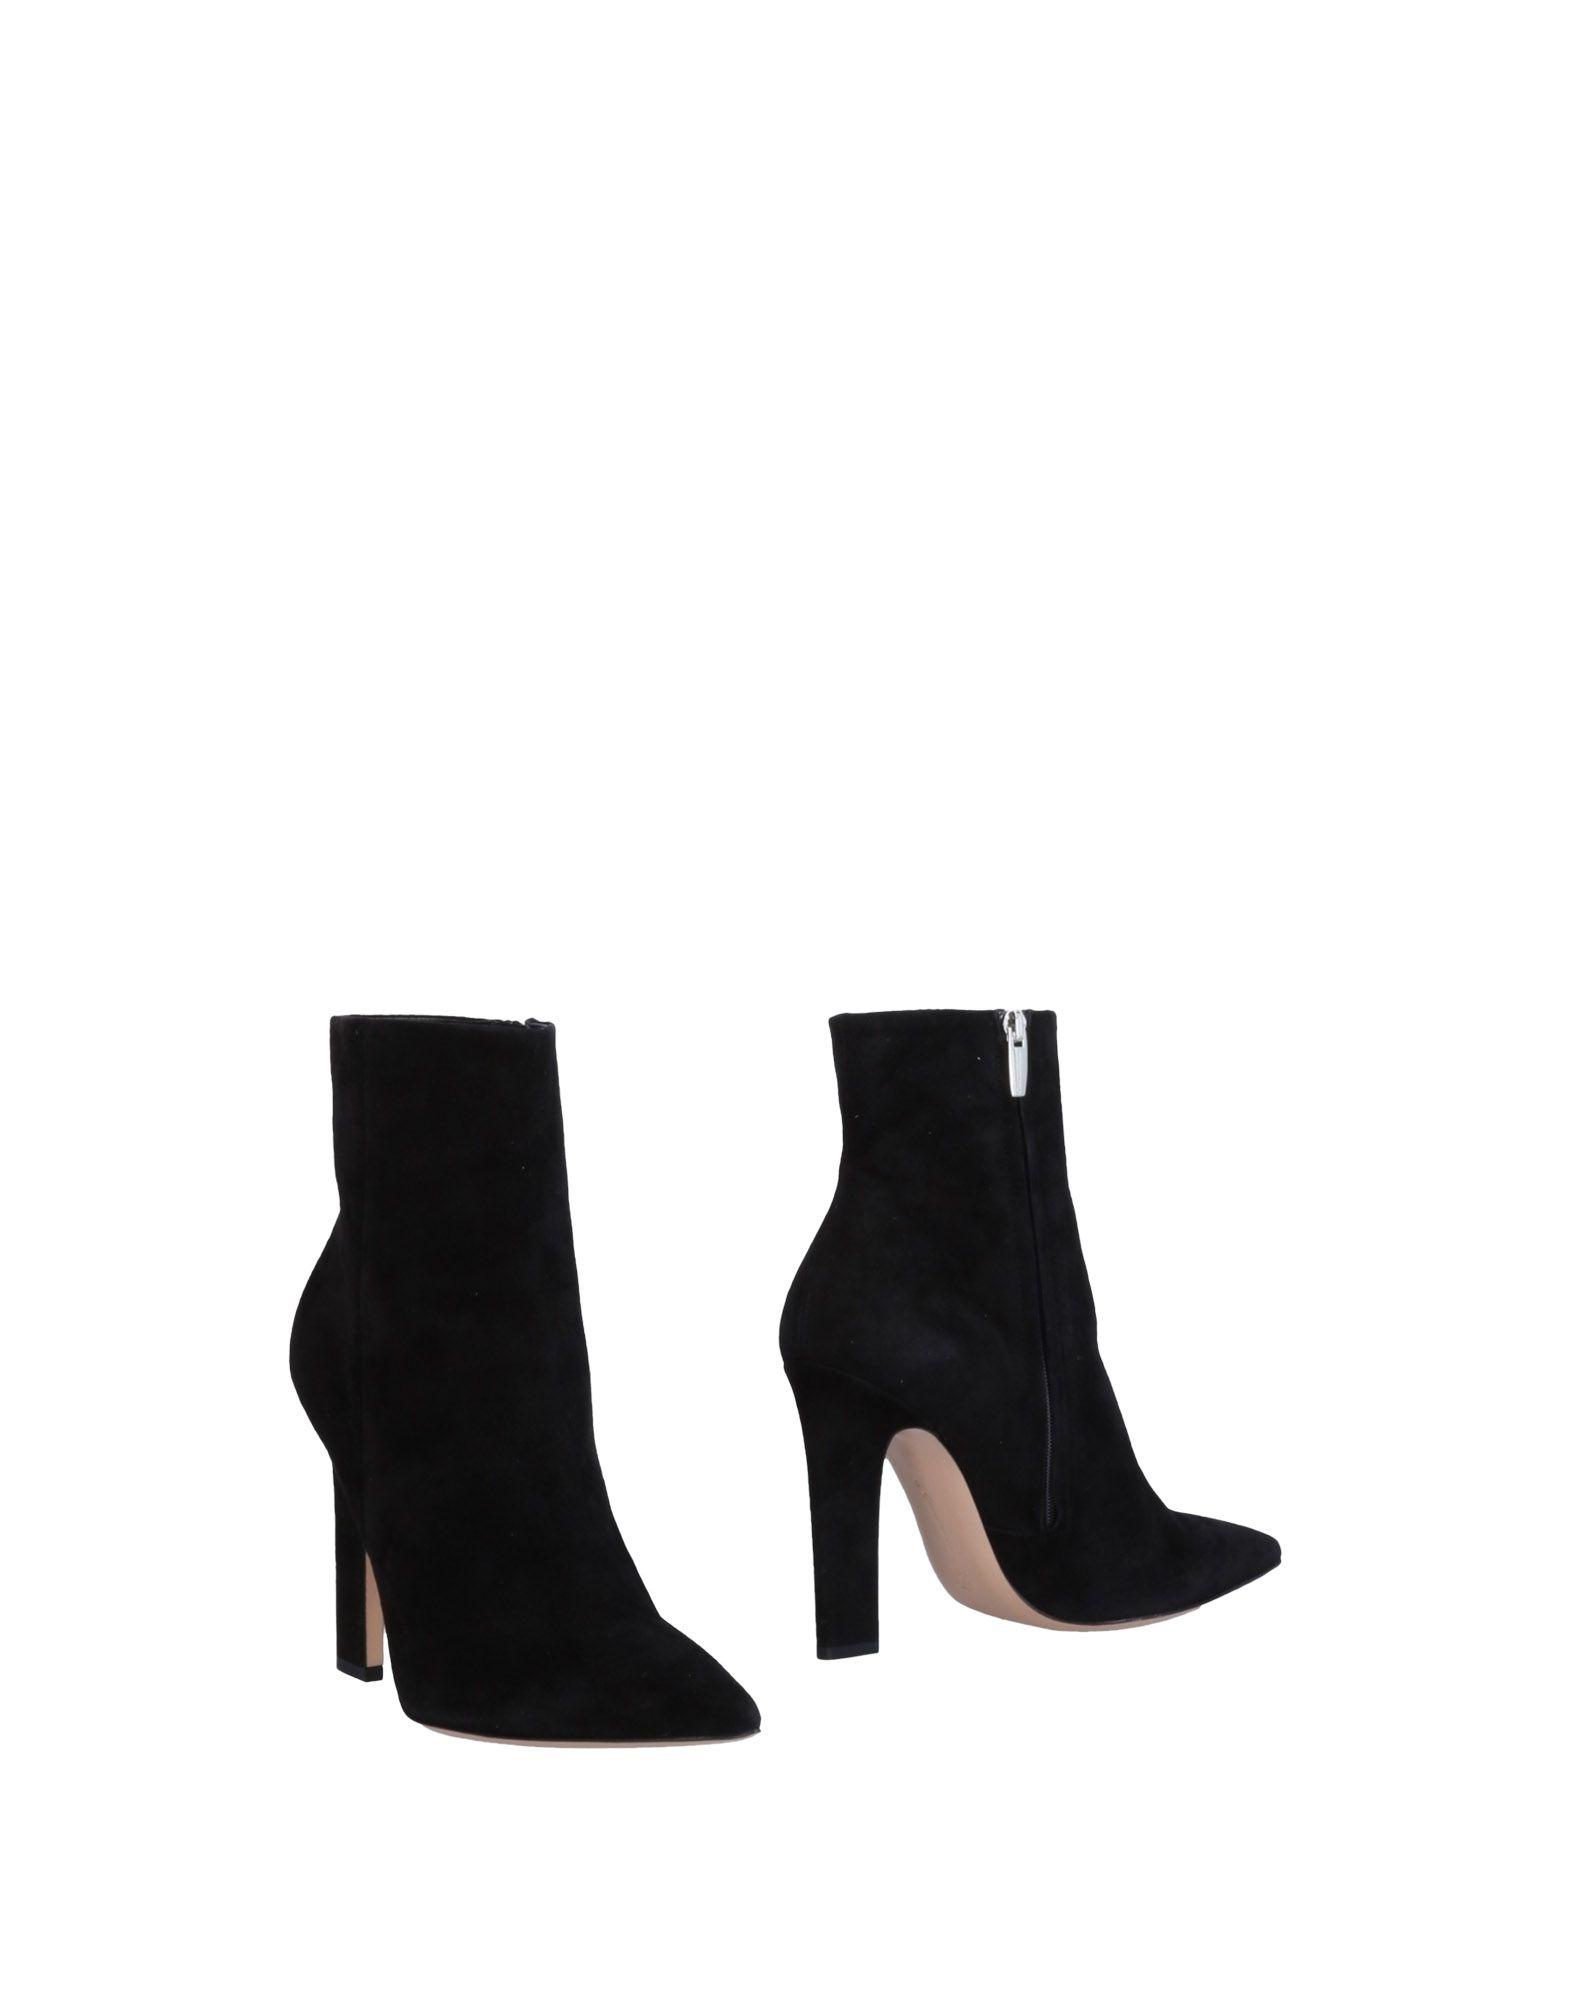 Gianvito Rossi  Stiefelette Damen  Rossi 11453641PM Beliebte Schuhe 8cd498